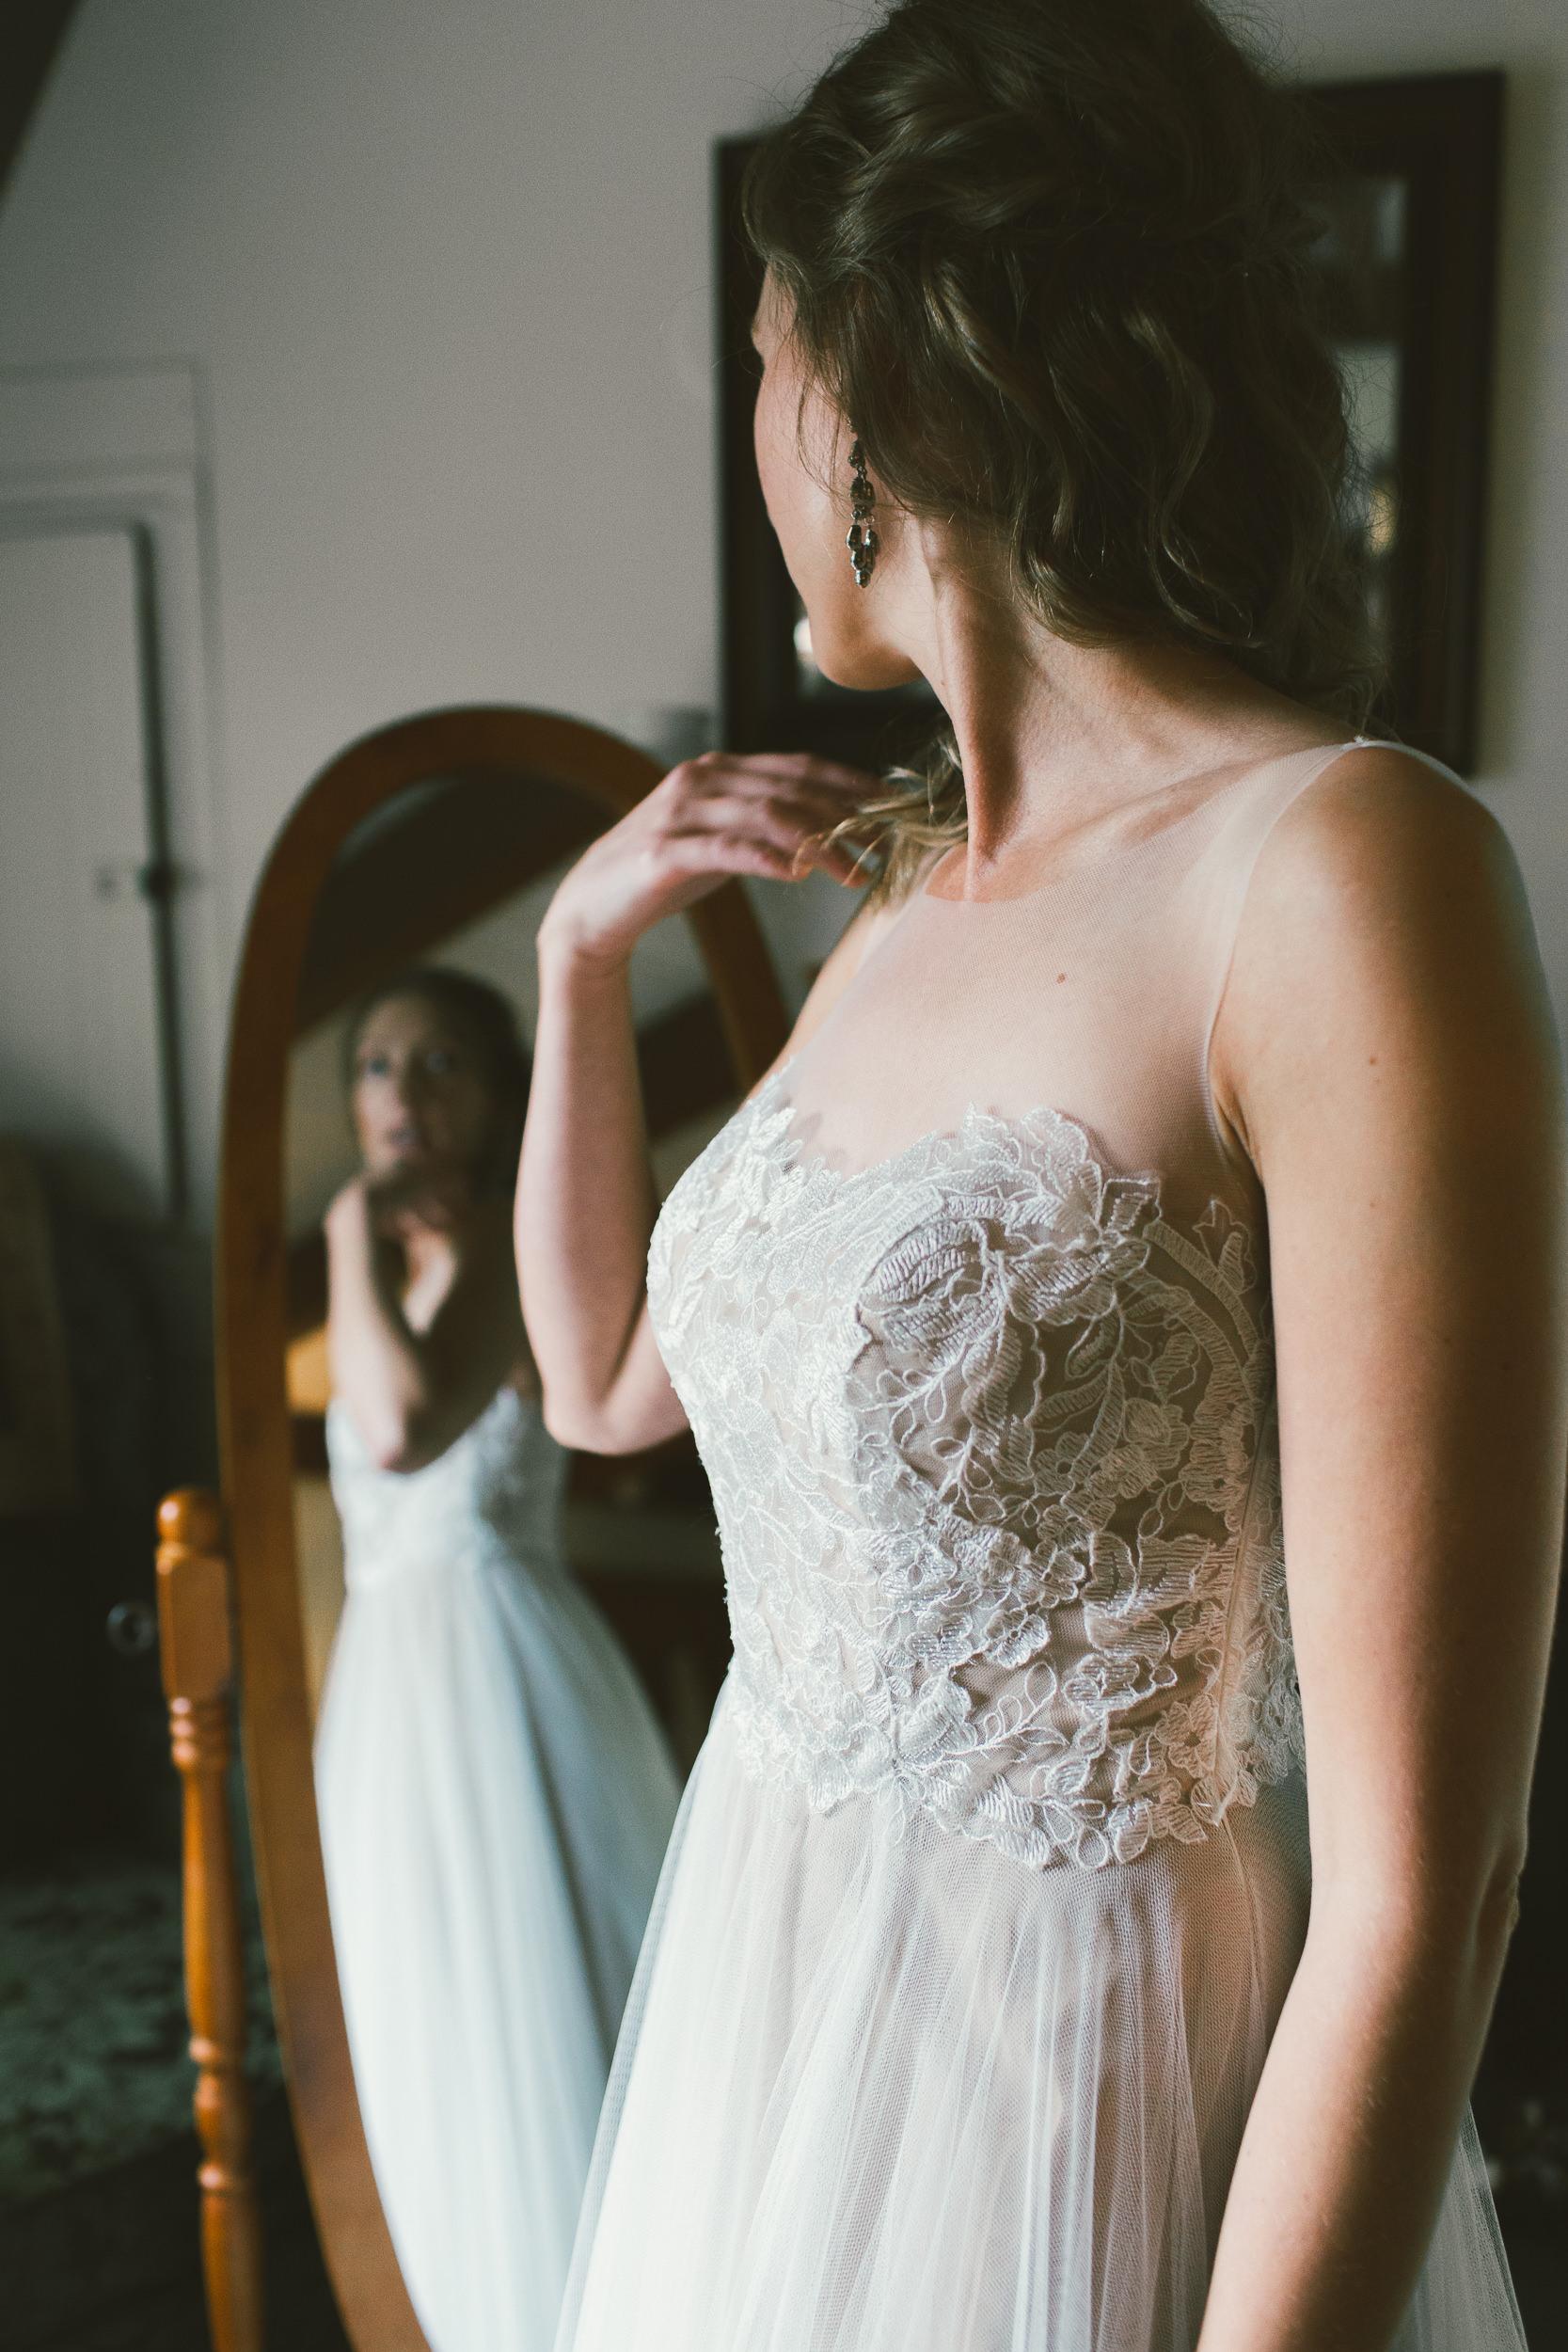 bride admiring herself in the mirror